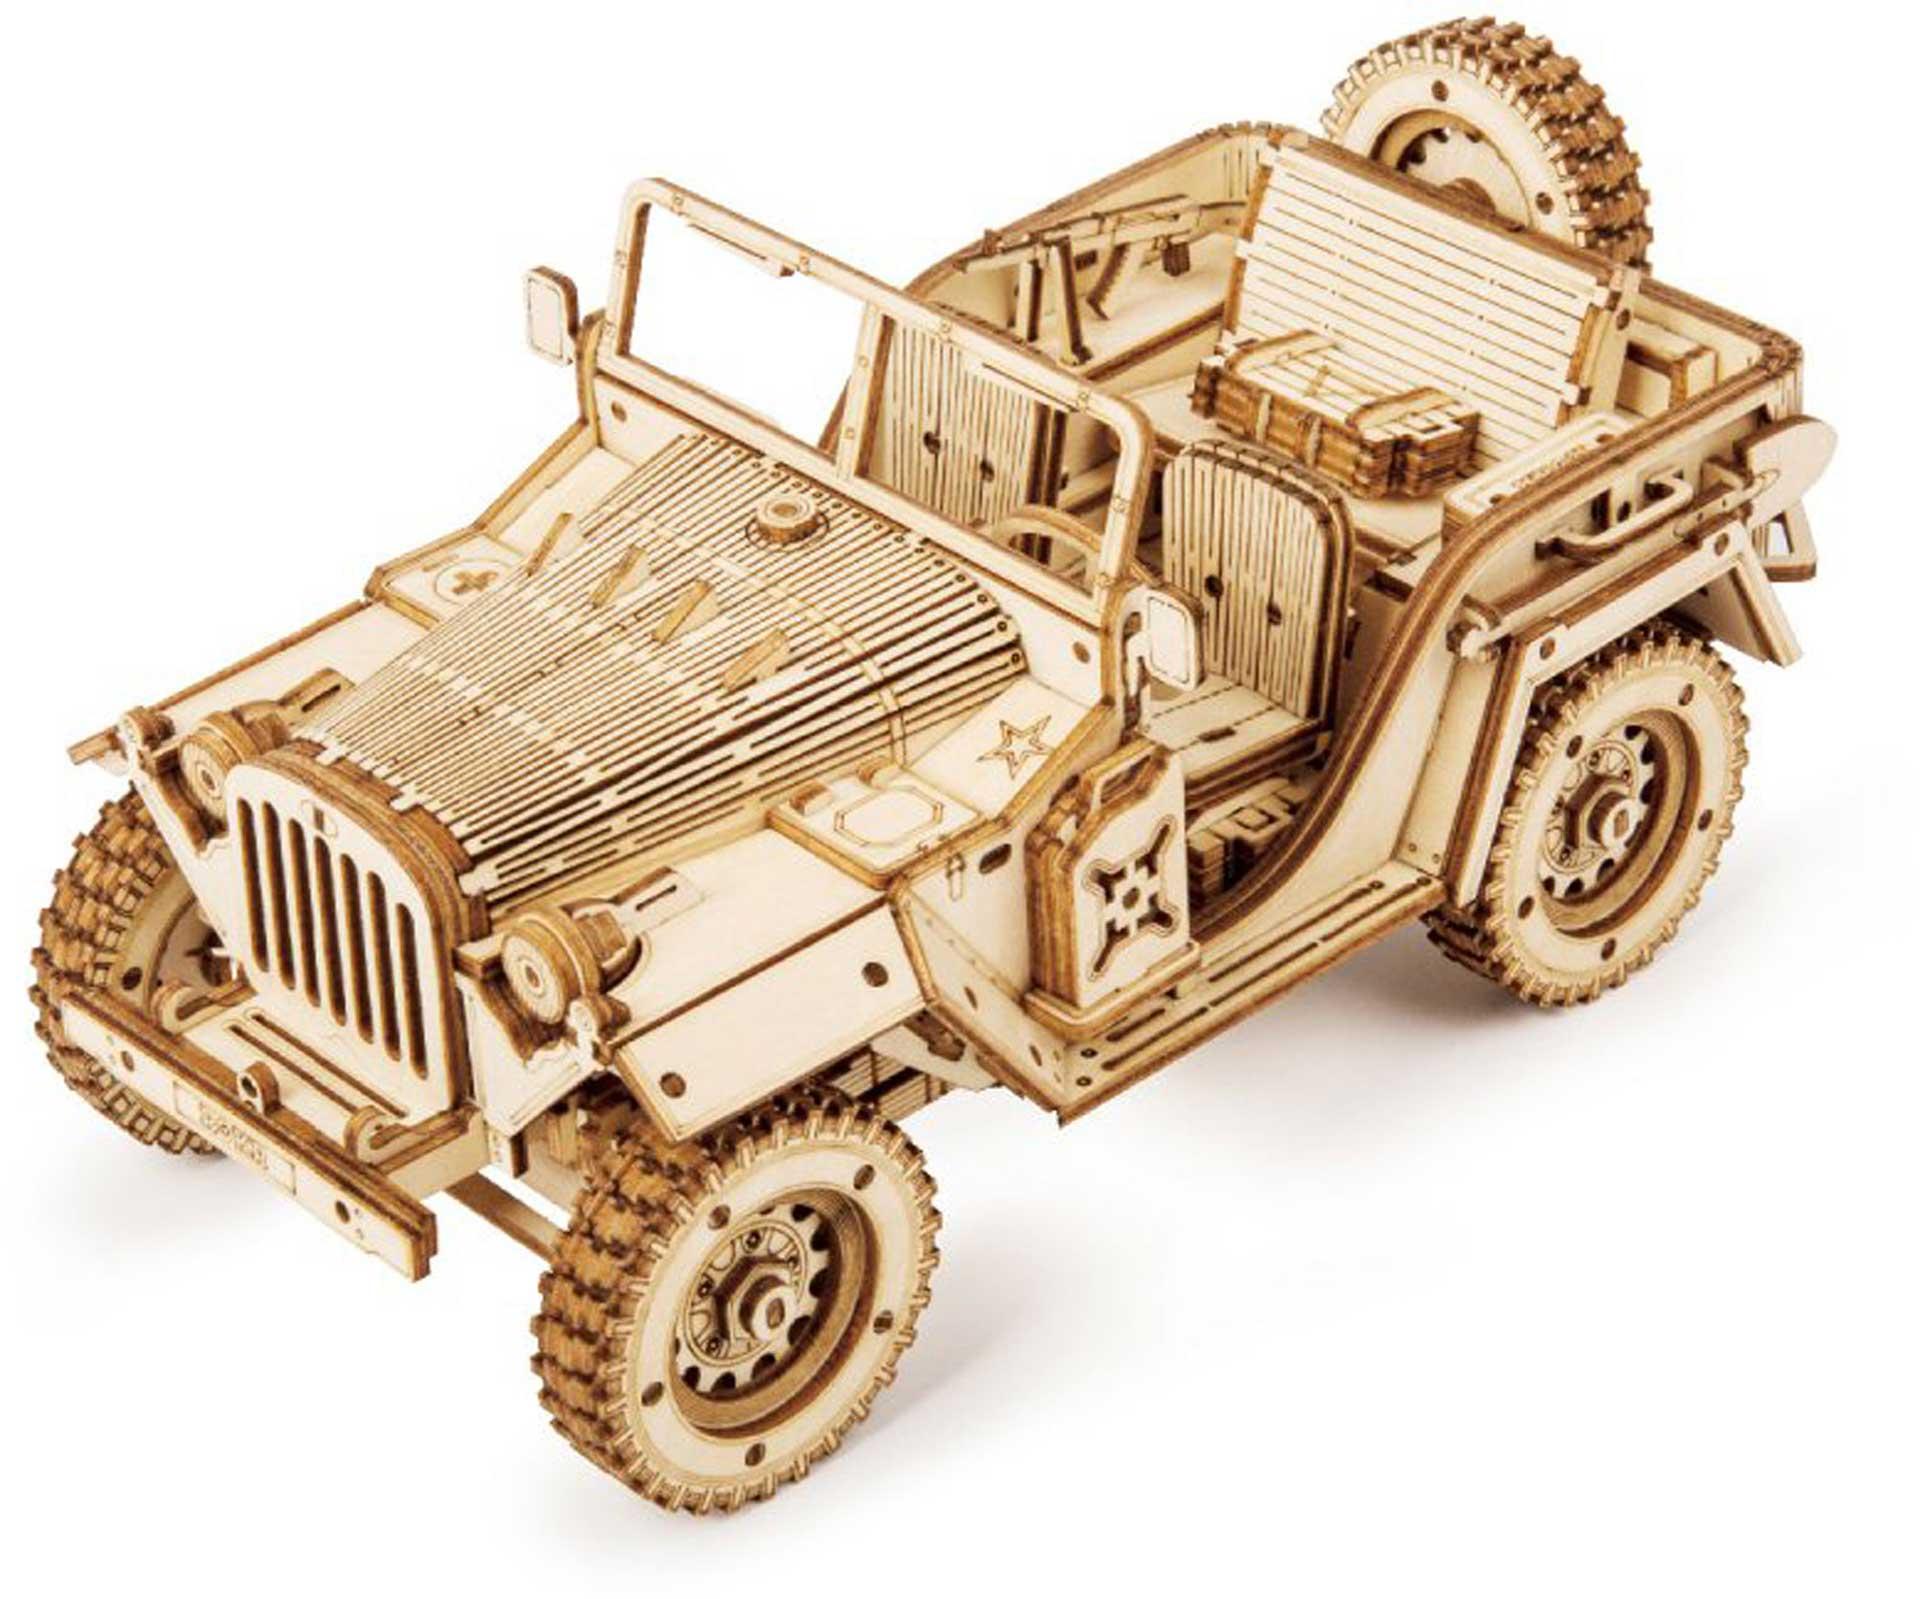 PICHLER Army Jeep (Lasercut wooden kit)